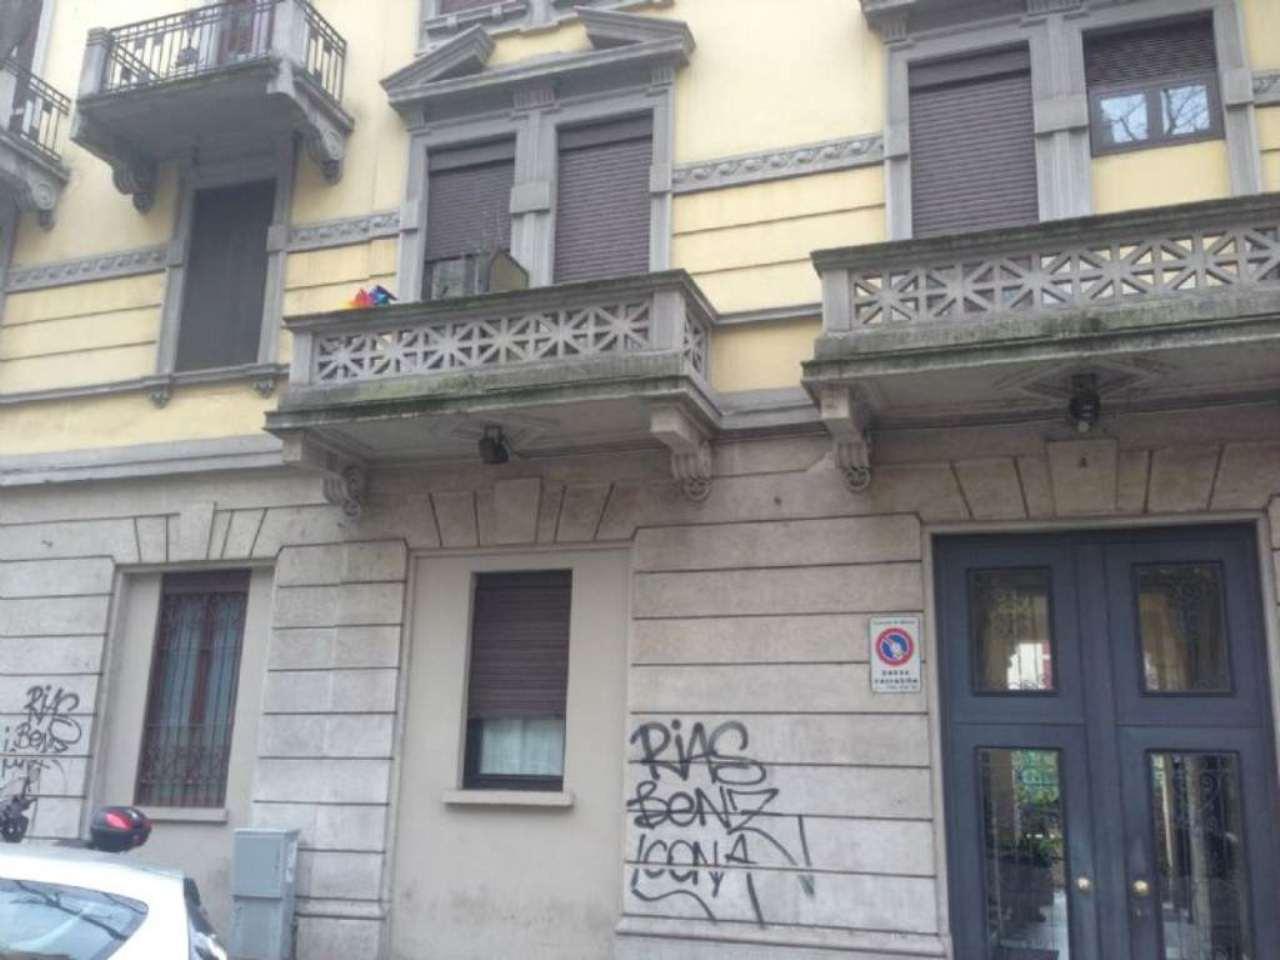 Bilocale Milano Via Via Ezio Biondi 3